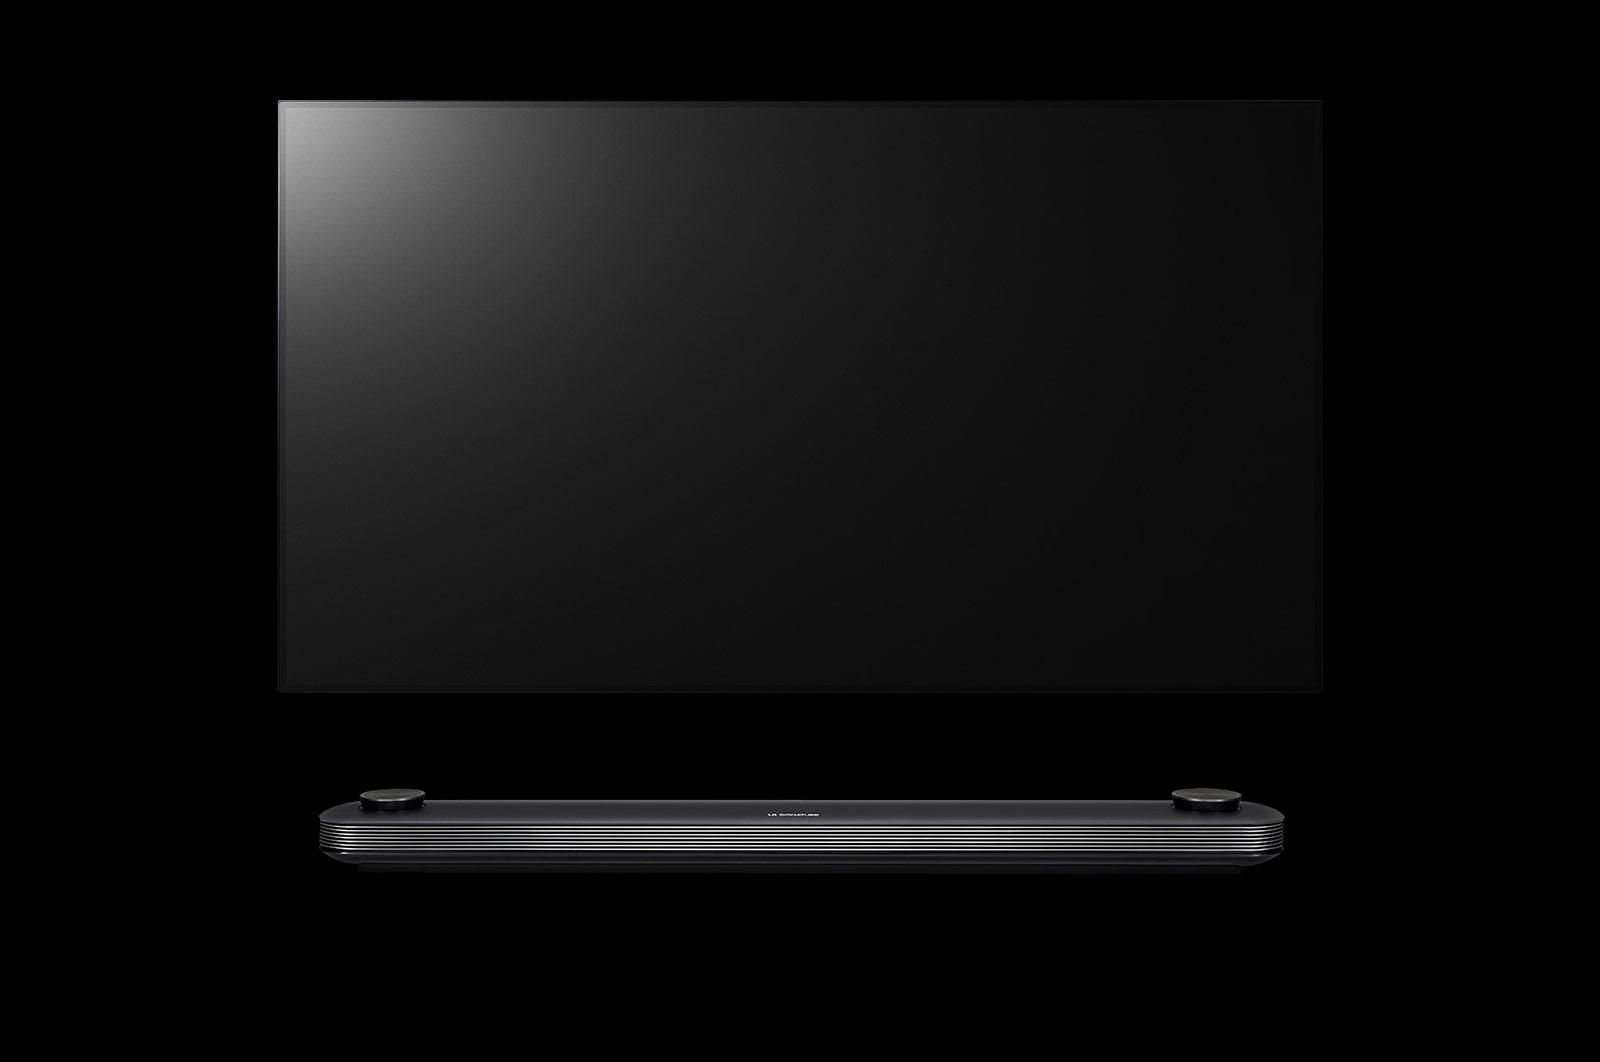 LG OLED77W8PLA telewizor premium OLED